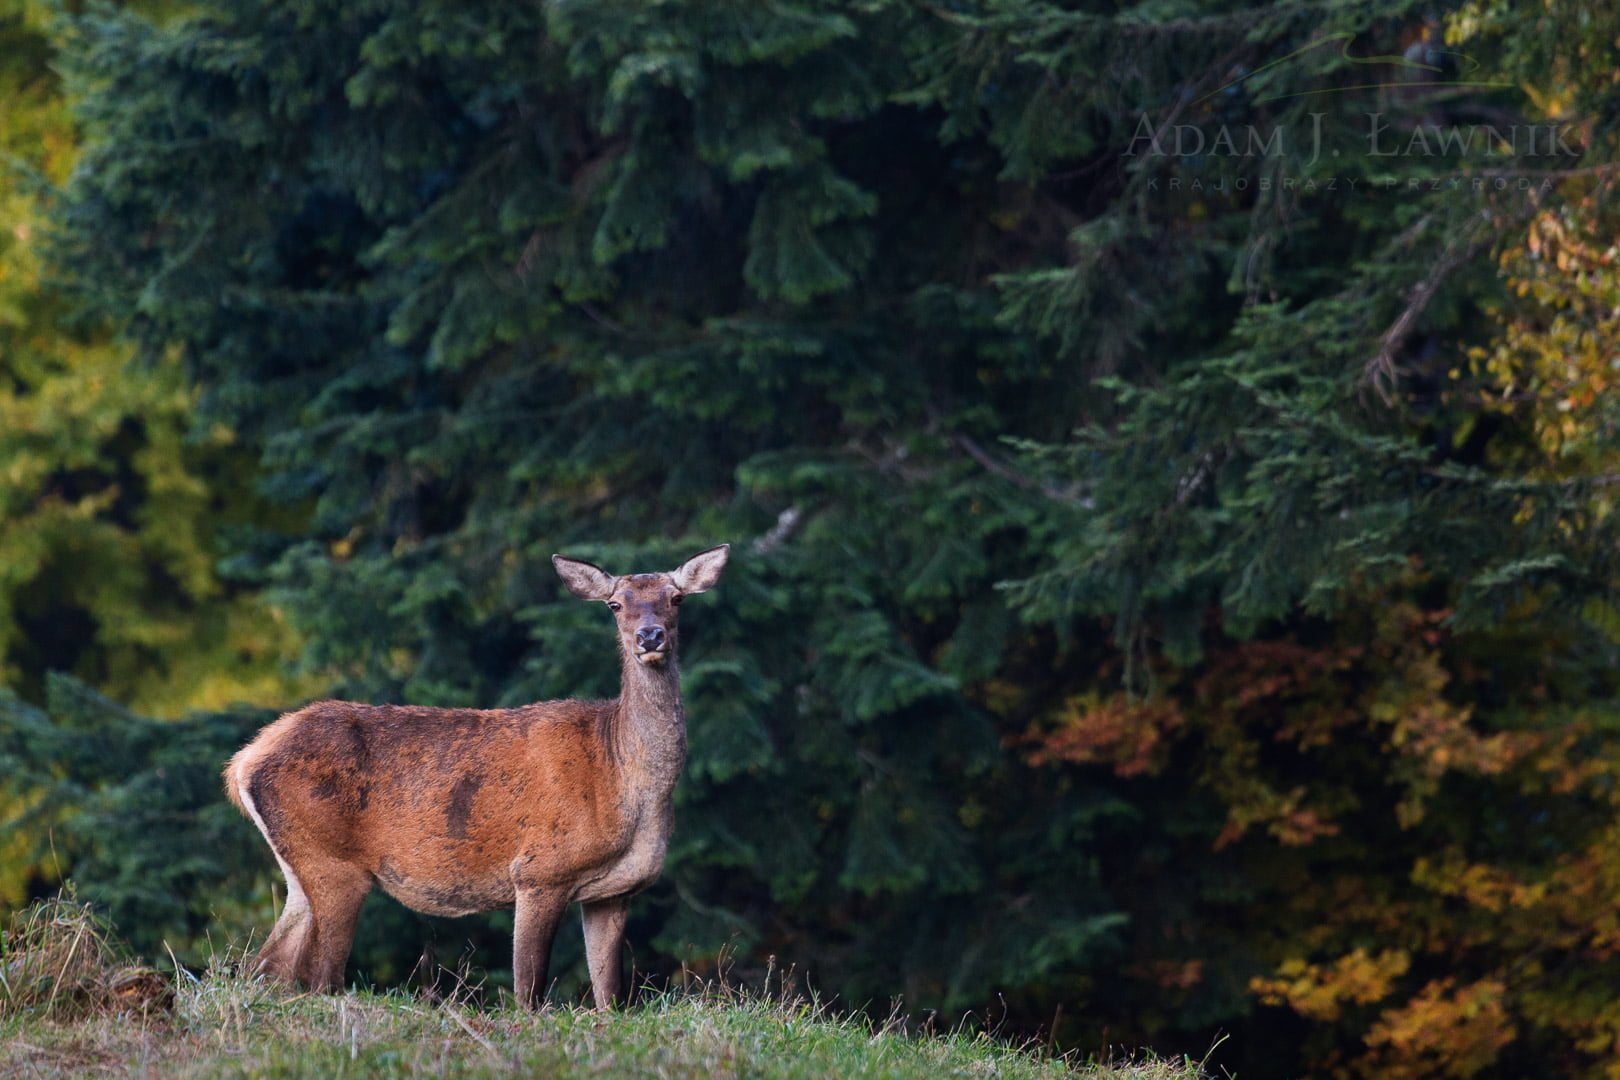 Pieniny National Park, Poland 1010-01474C